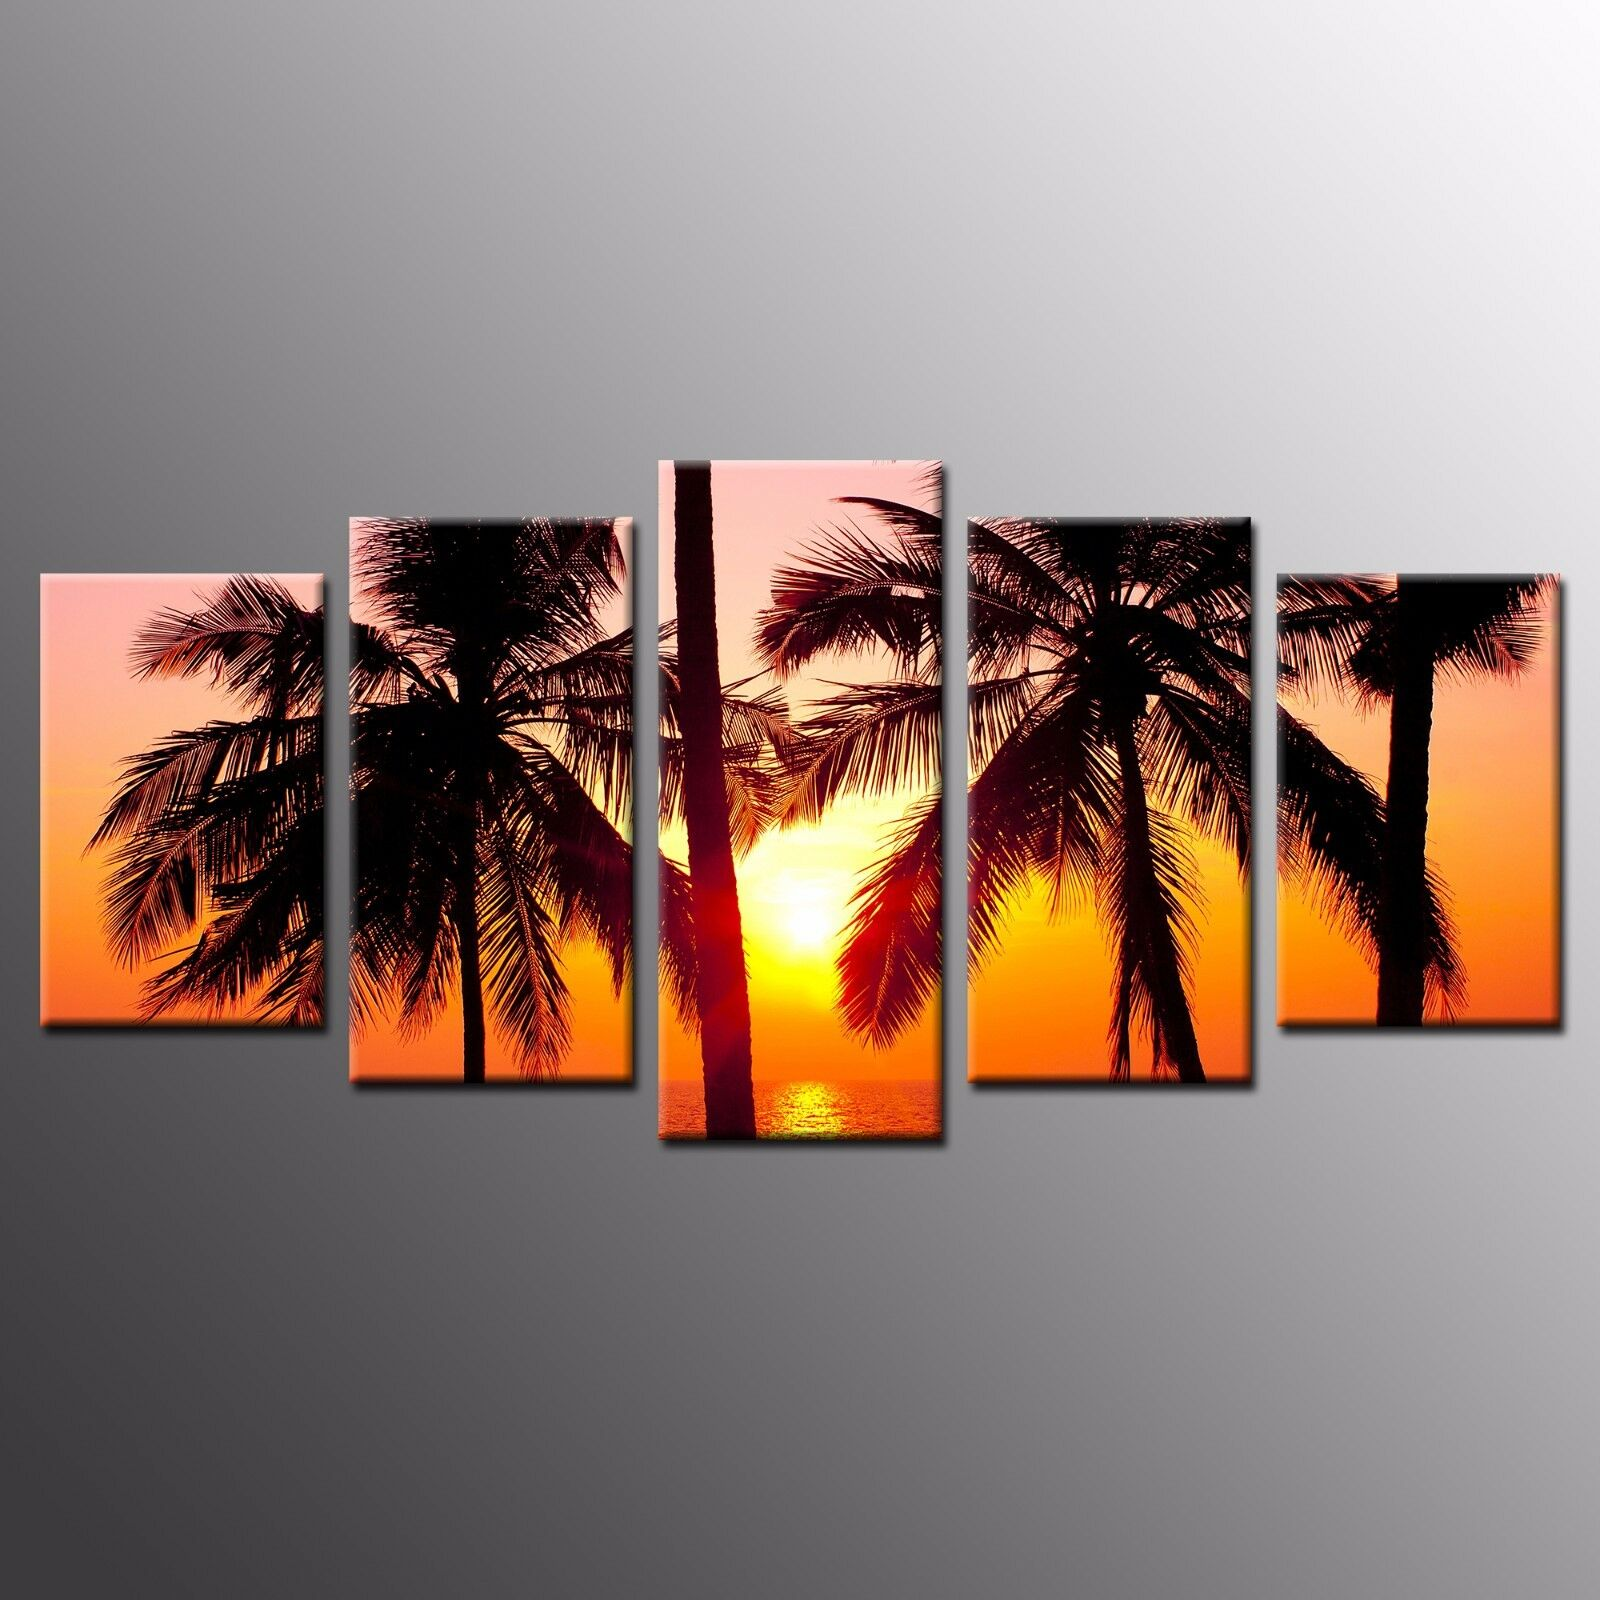 FRAMED Landscape Canvas Prints Coconut Trees Sunset Wall Art For Room Decor-5pcs